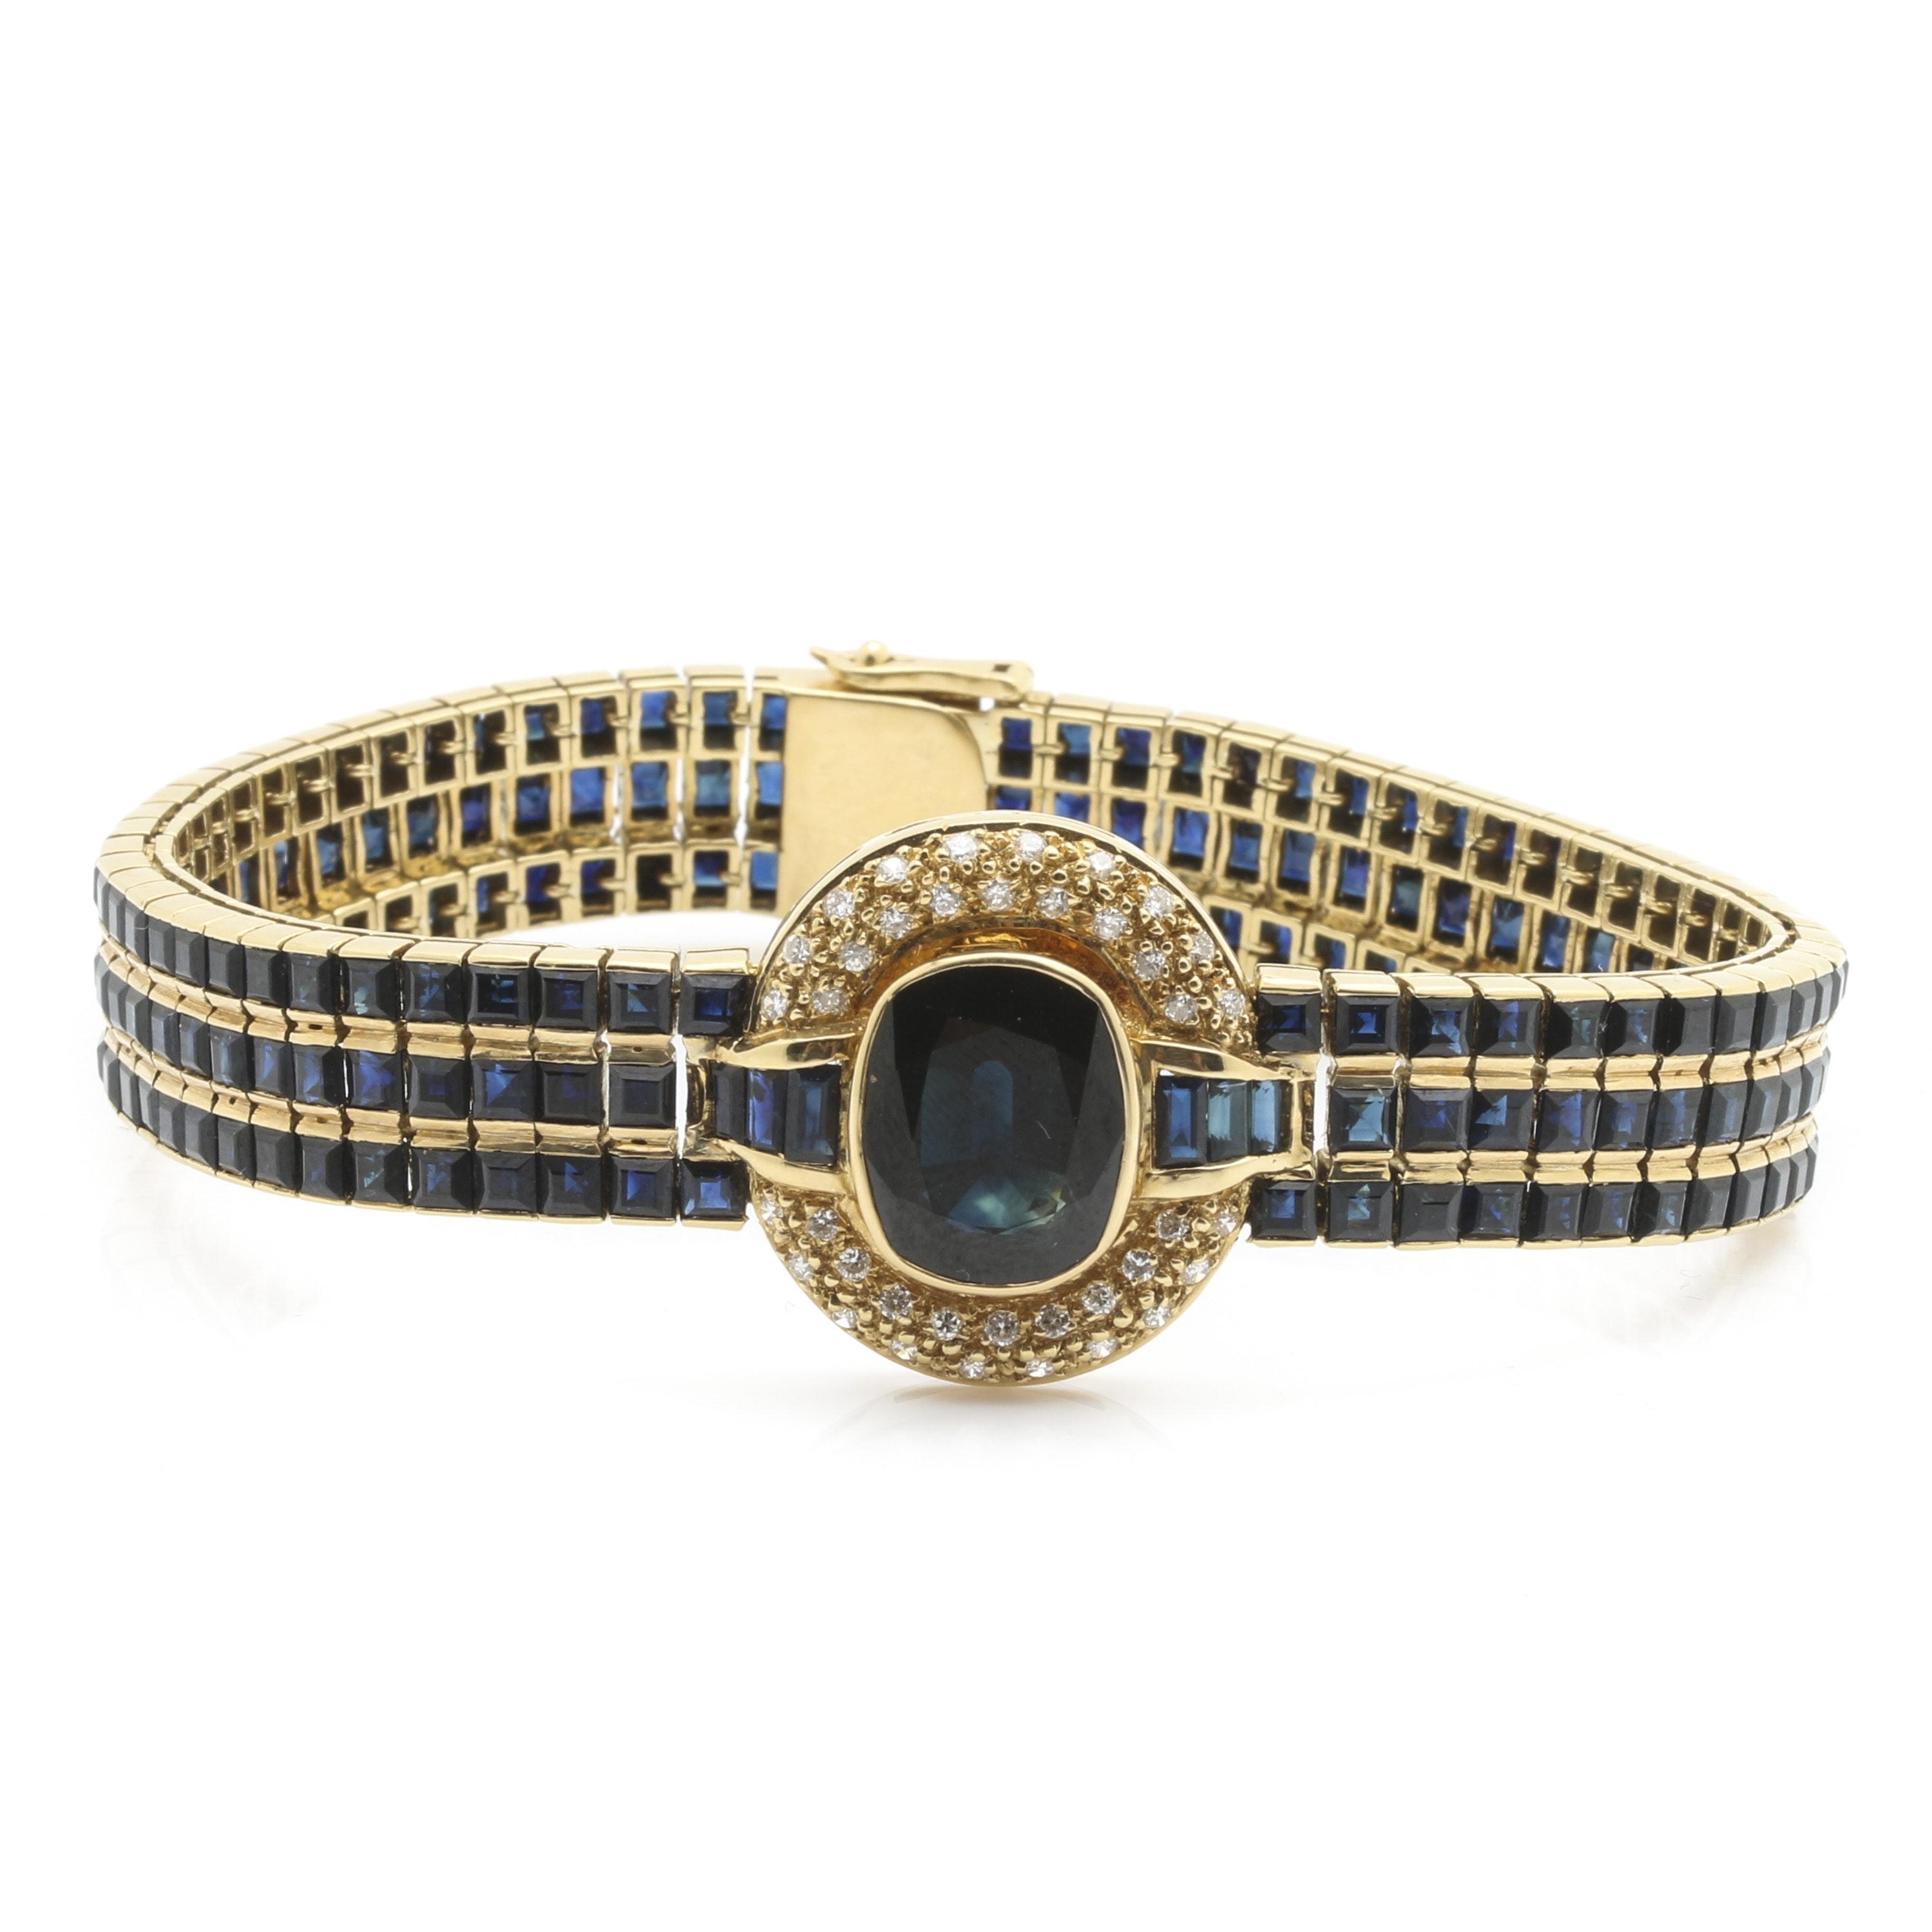 LeVian 18K Yellow Gold 6.87 Carat Sapphire and Diamond Bracelet